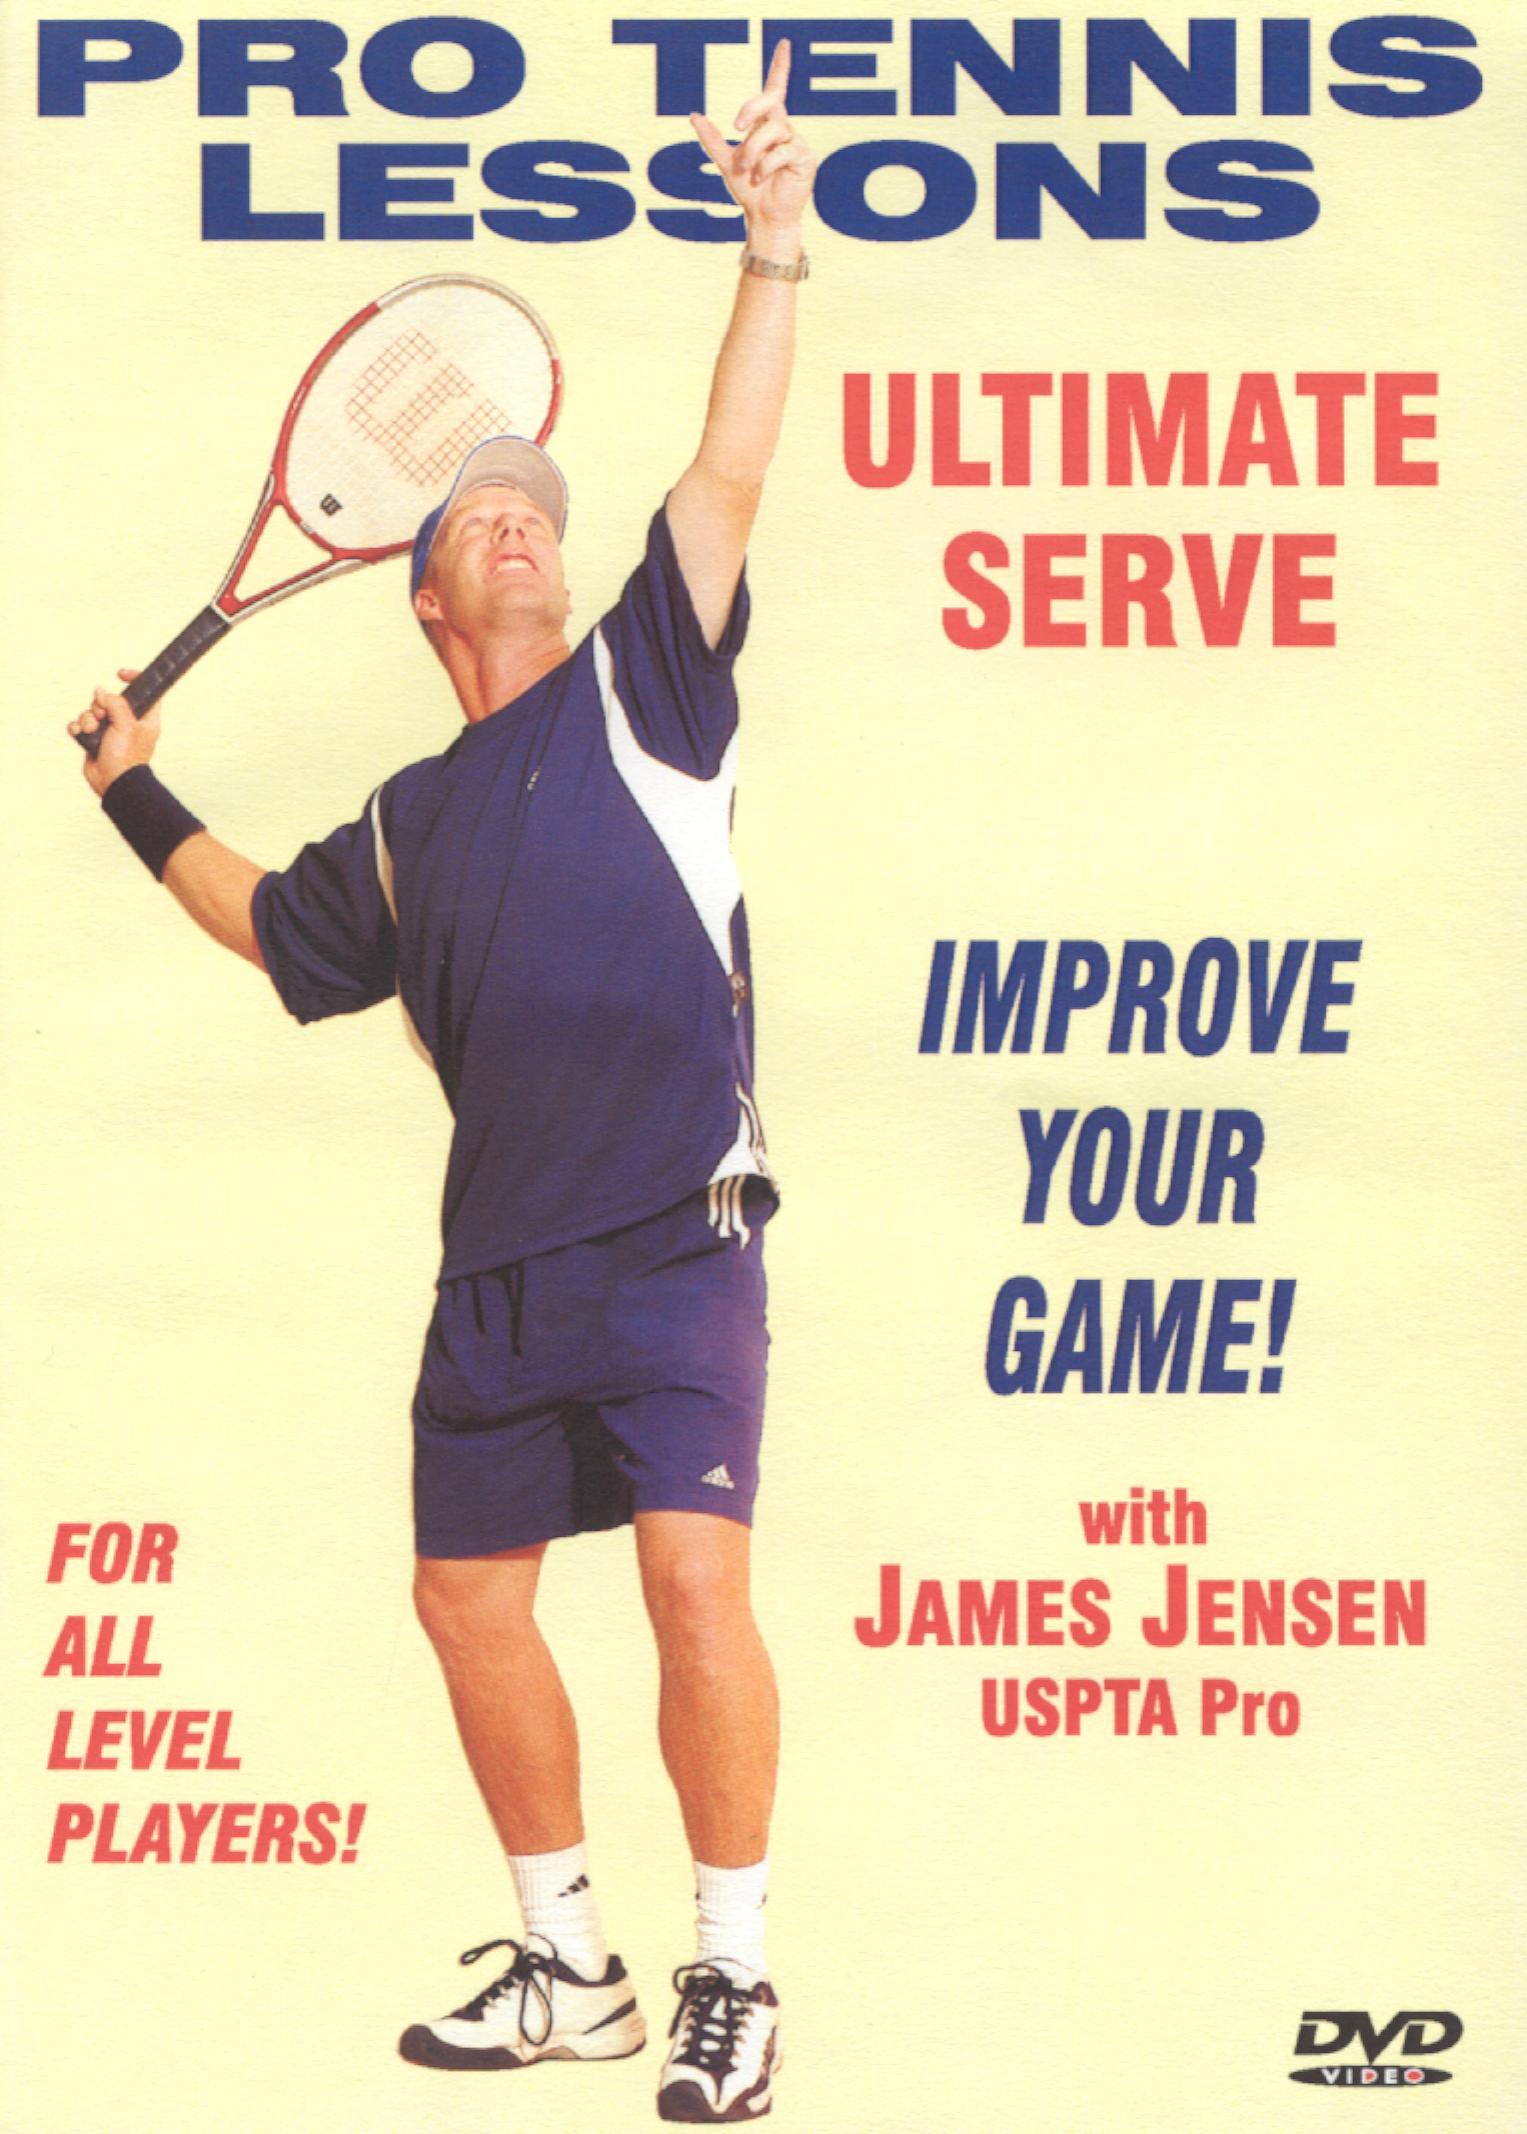 Pro Tennis Lessons: Ultimate Serve